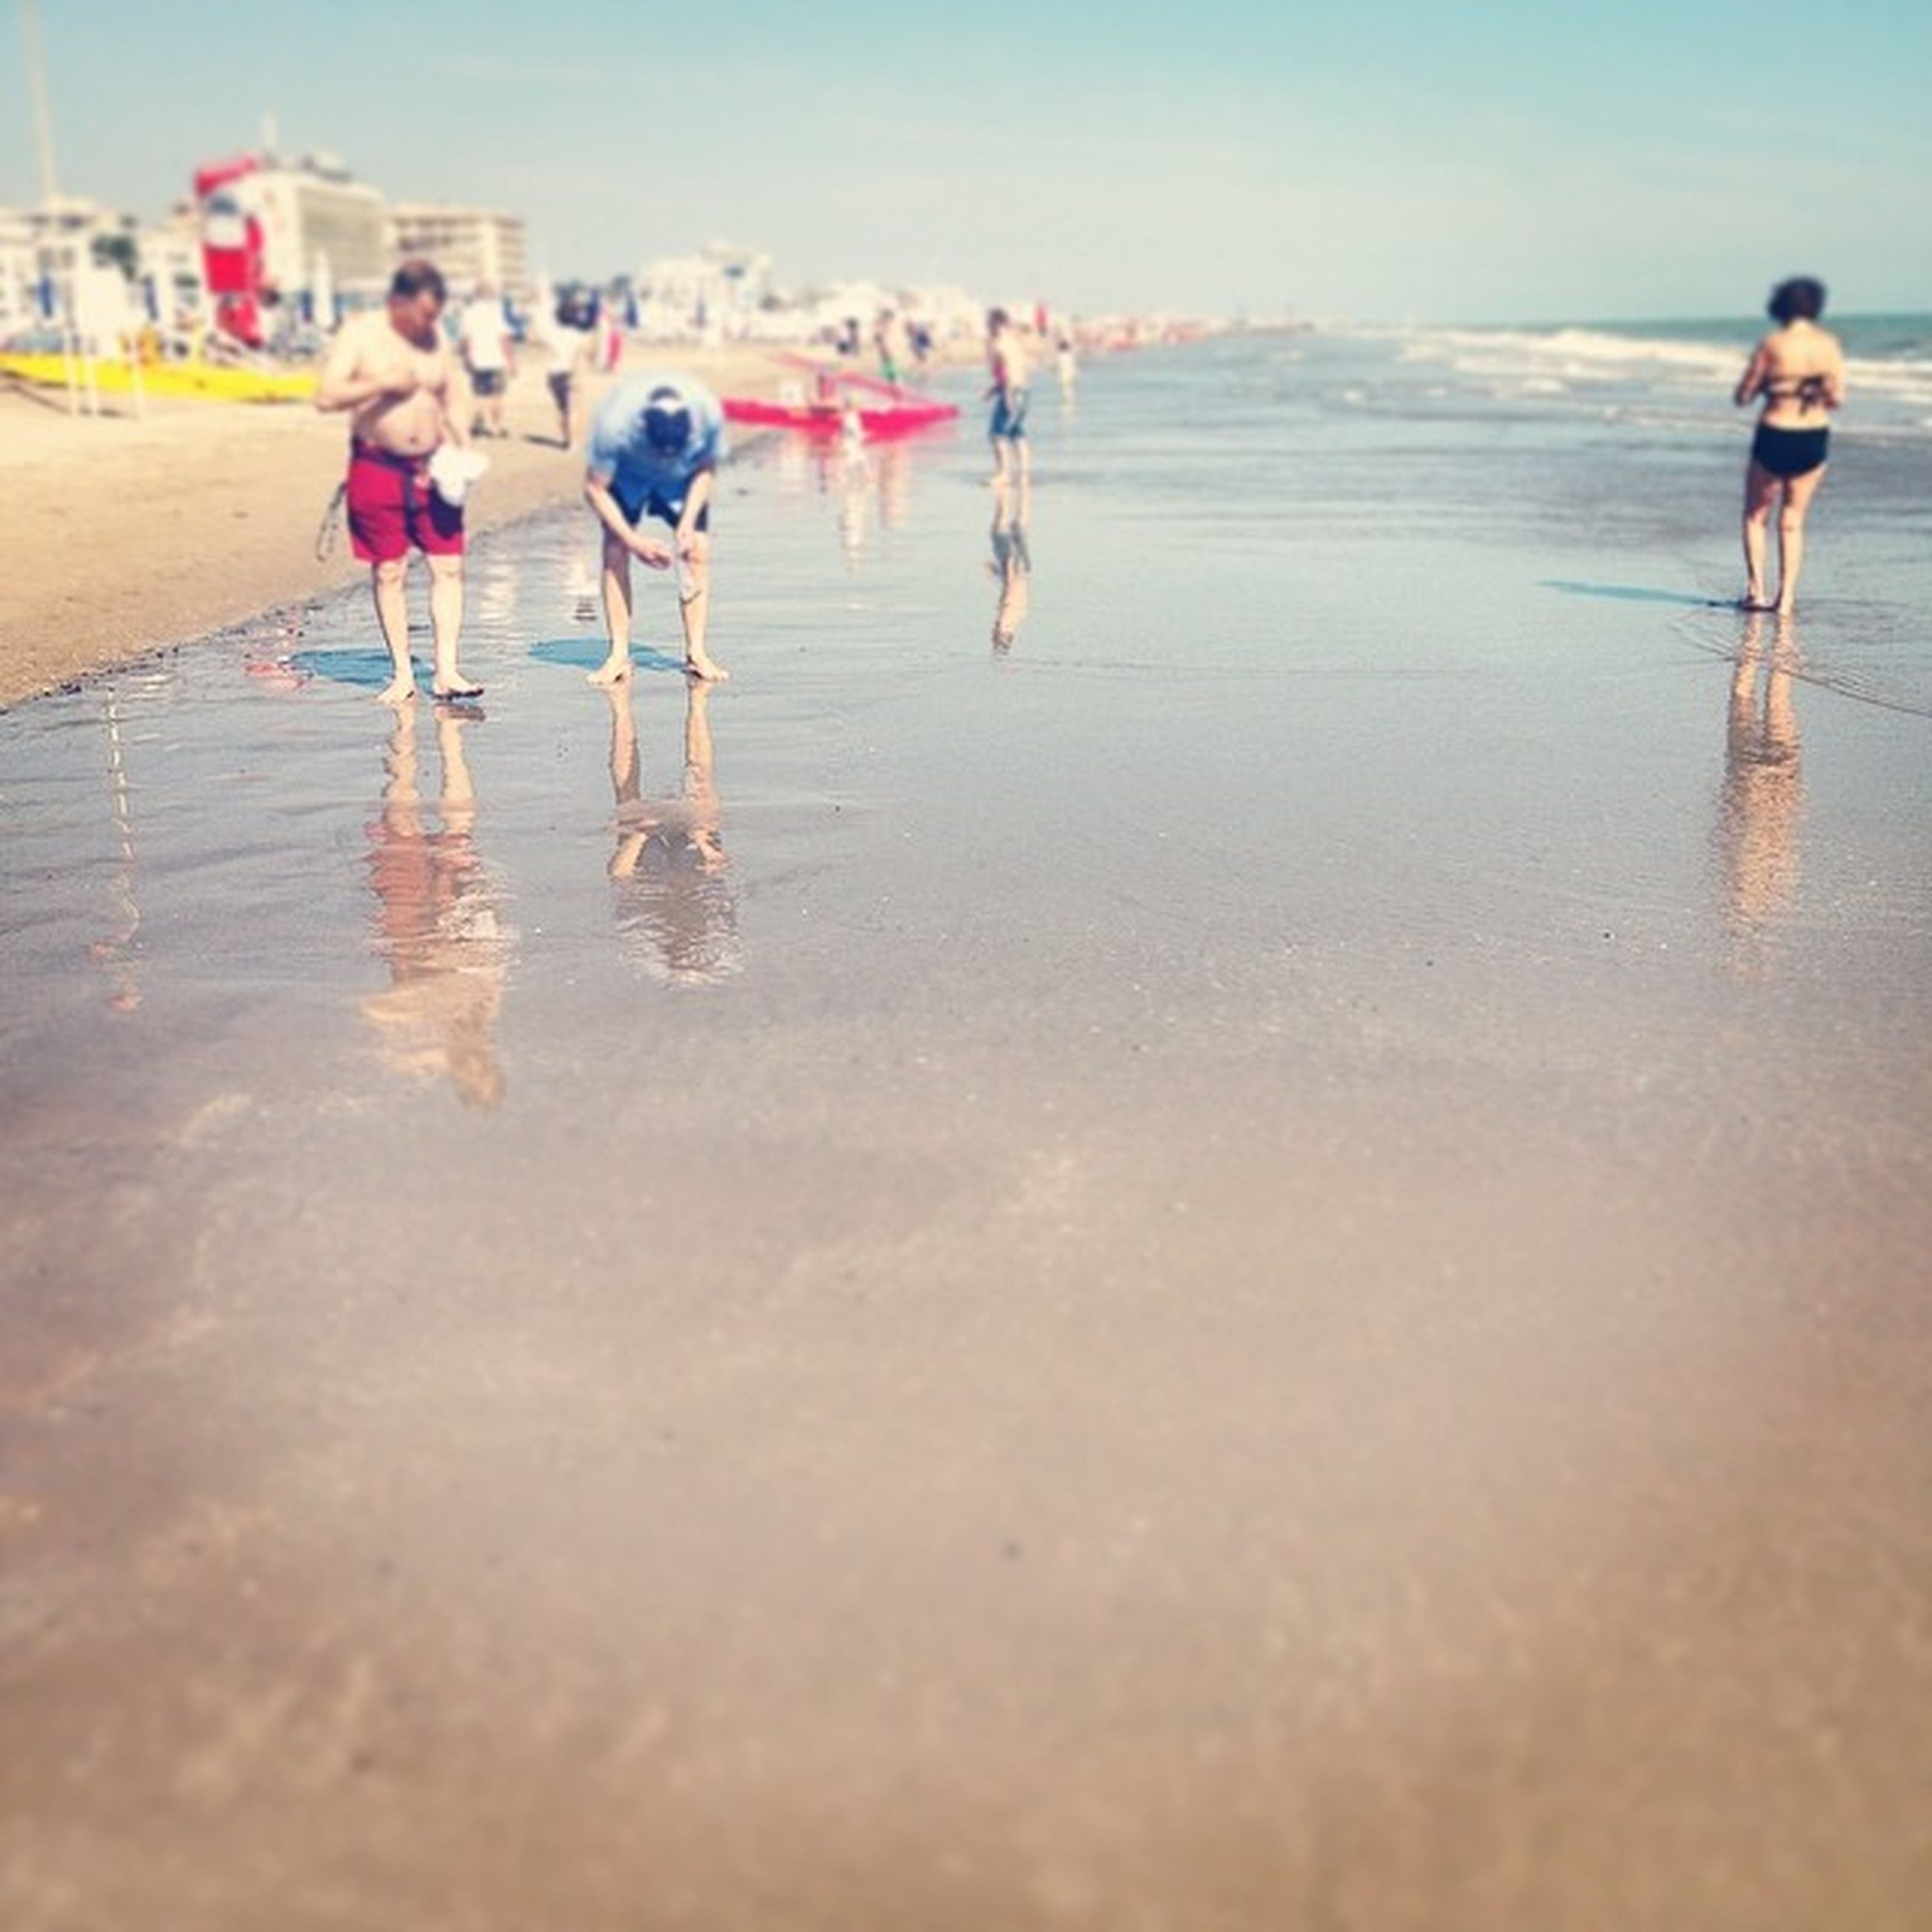 water, beach, sea, lifestyles, leisure activity, sand, shore, vacations, walking, full length, wave, person, wet, enjoyment, standing, men, weekend activities, girls